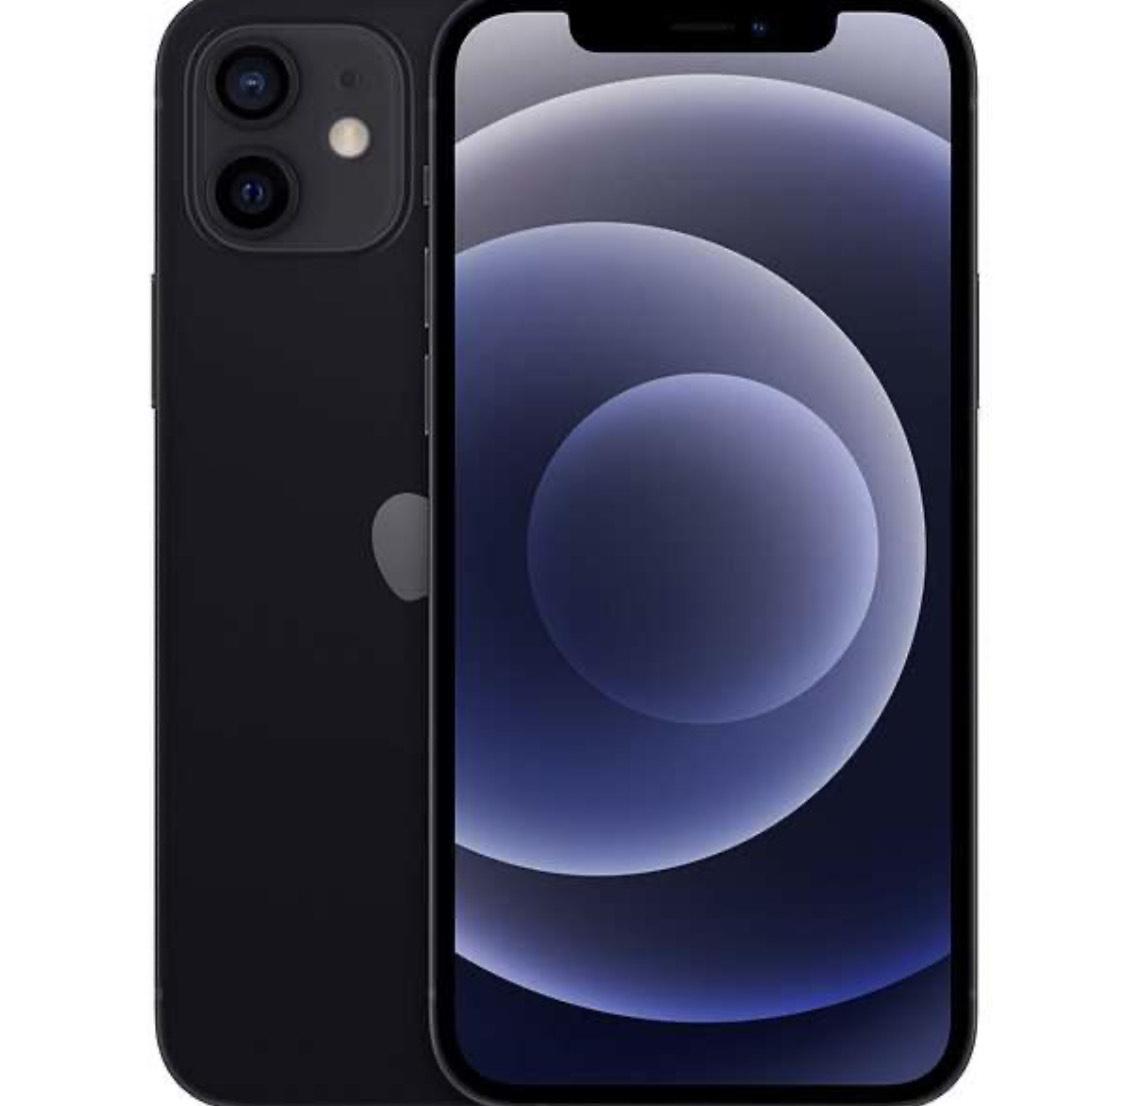 Apple iPhone 12 (64GB) mit o2 Free Unlimited Smart Junge Leute (Unlimited LTE I 5G, VoLTE, WLAN Call) für 458,99€ ZZ & mtl. 29,99€